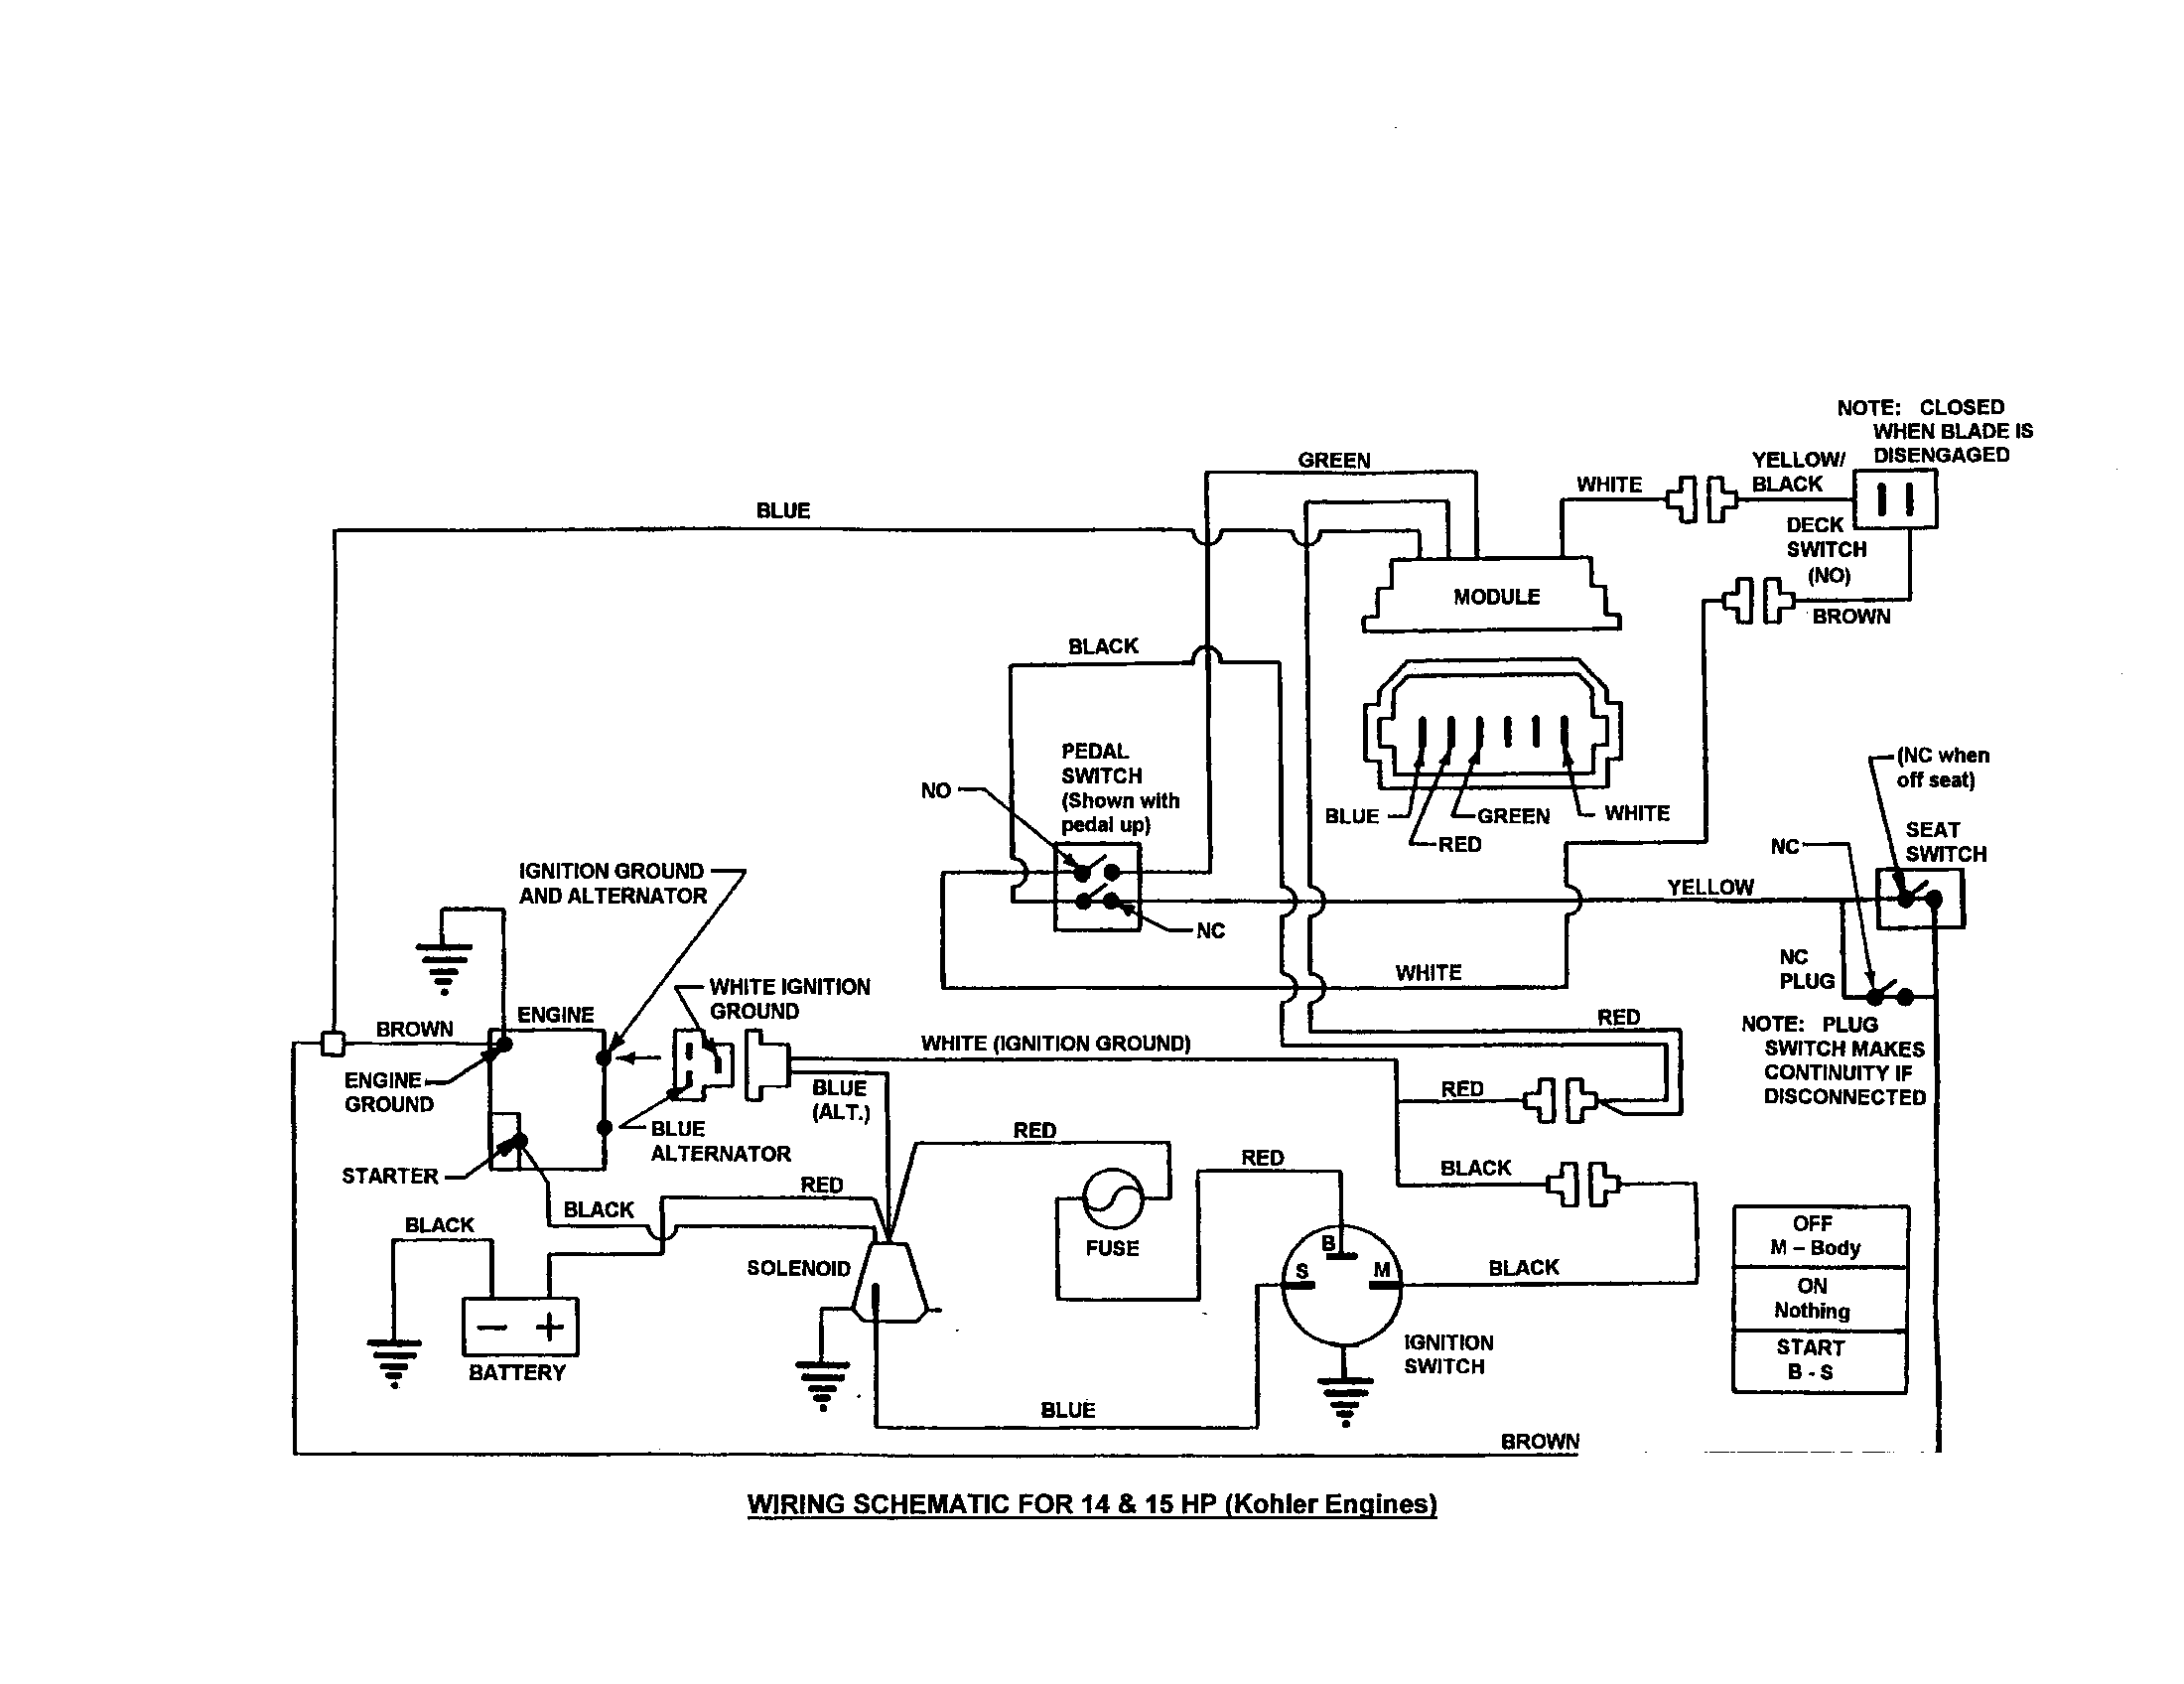 ao_9832] 285 wiring diagram snapper riding mower wiring diagram snapper  mower download diagram  scata odga cette pap mohammedshrine librar wiring 101